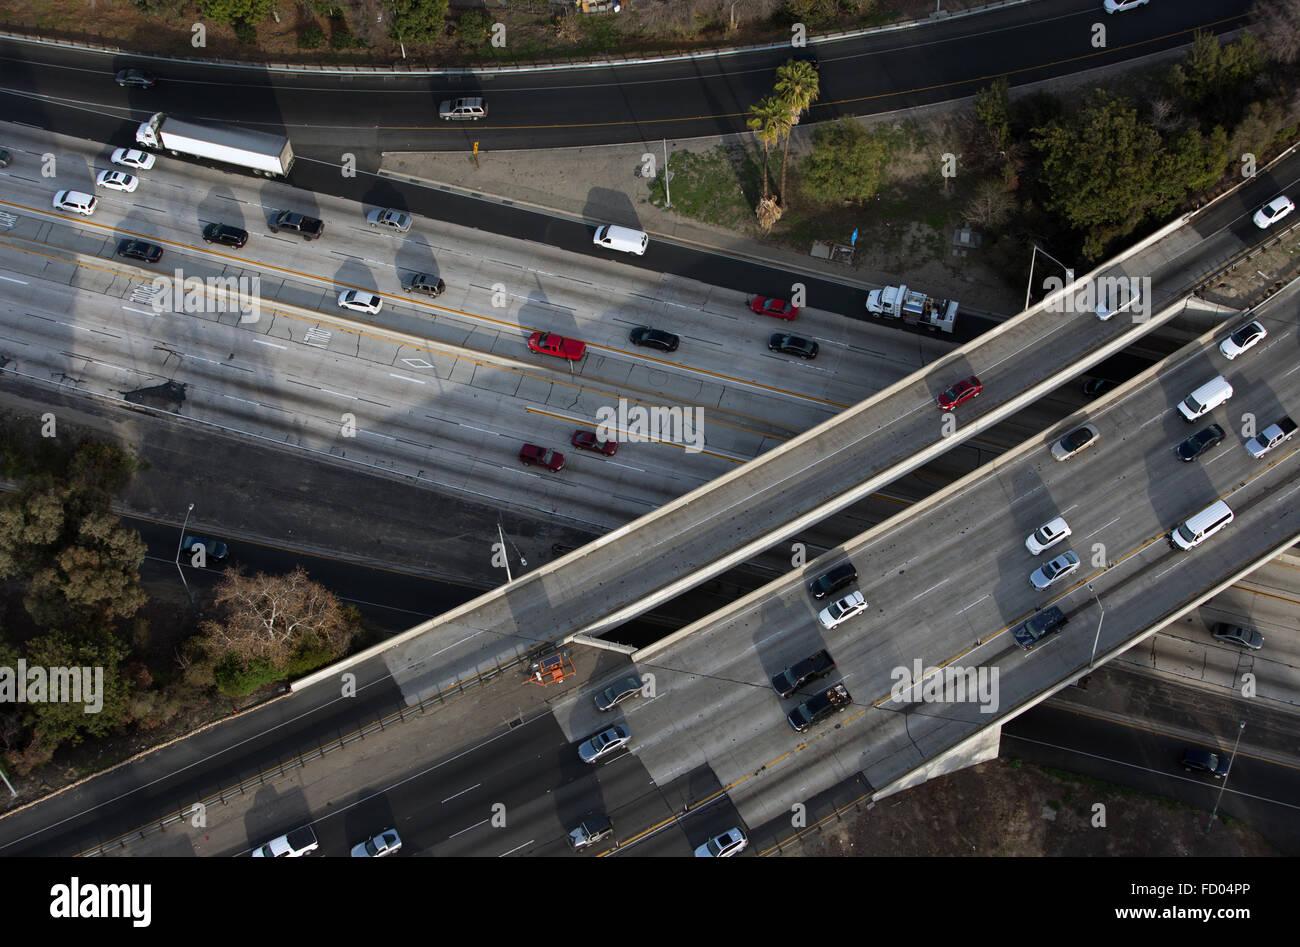 Los Angeles antenna vista freeway. Immagini Stock